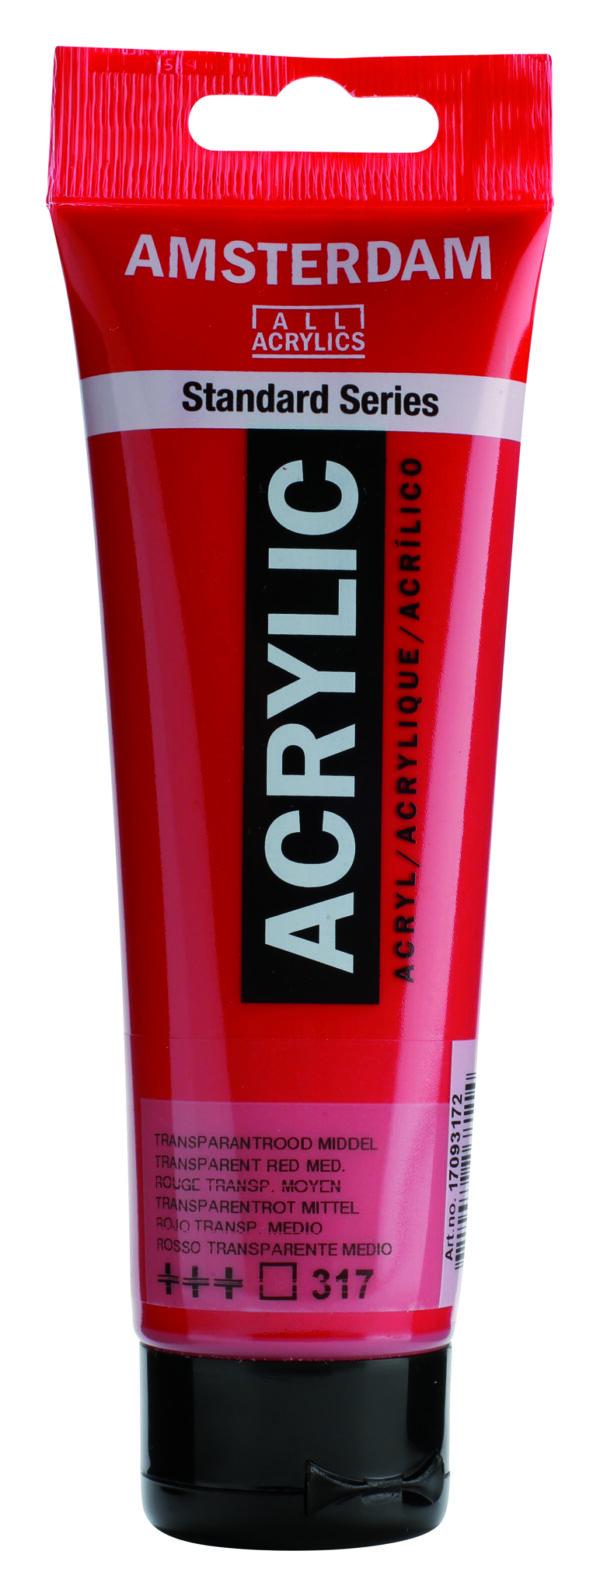 Ams std 317 Transparent red Medium - 120 ml